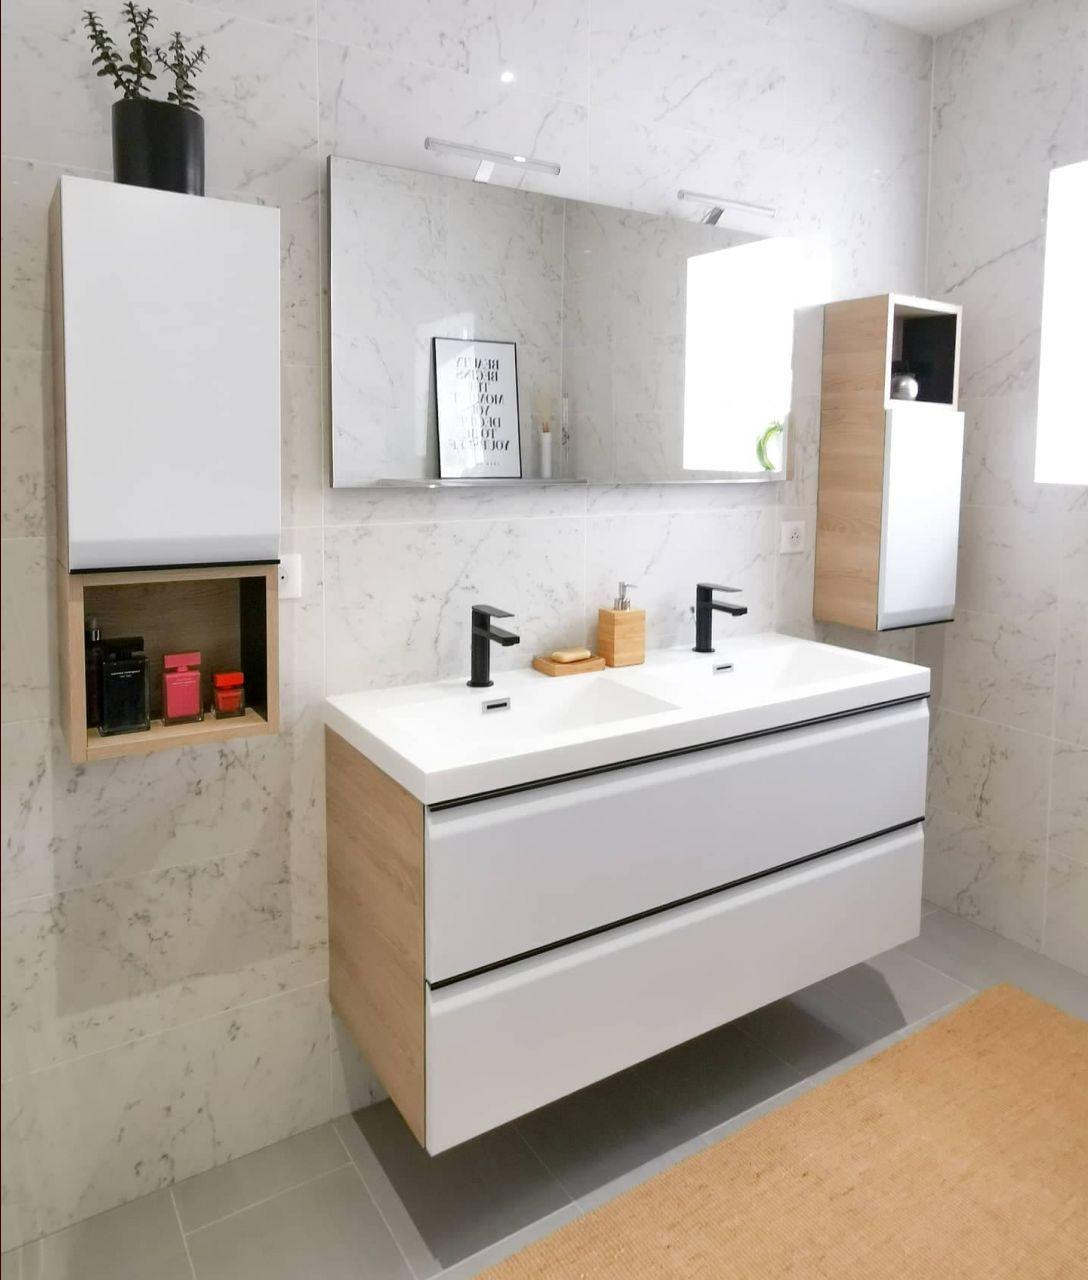 Meubles de salle de bain repeints en blanc